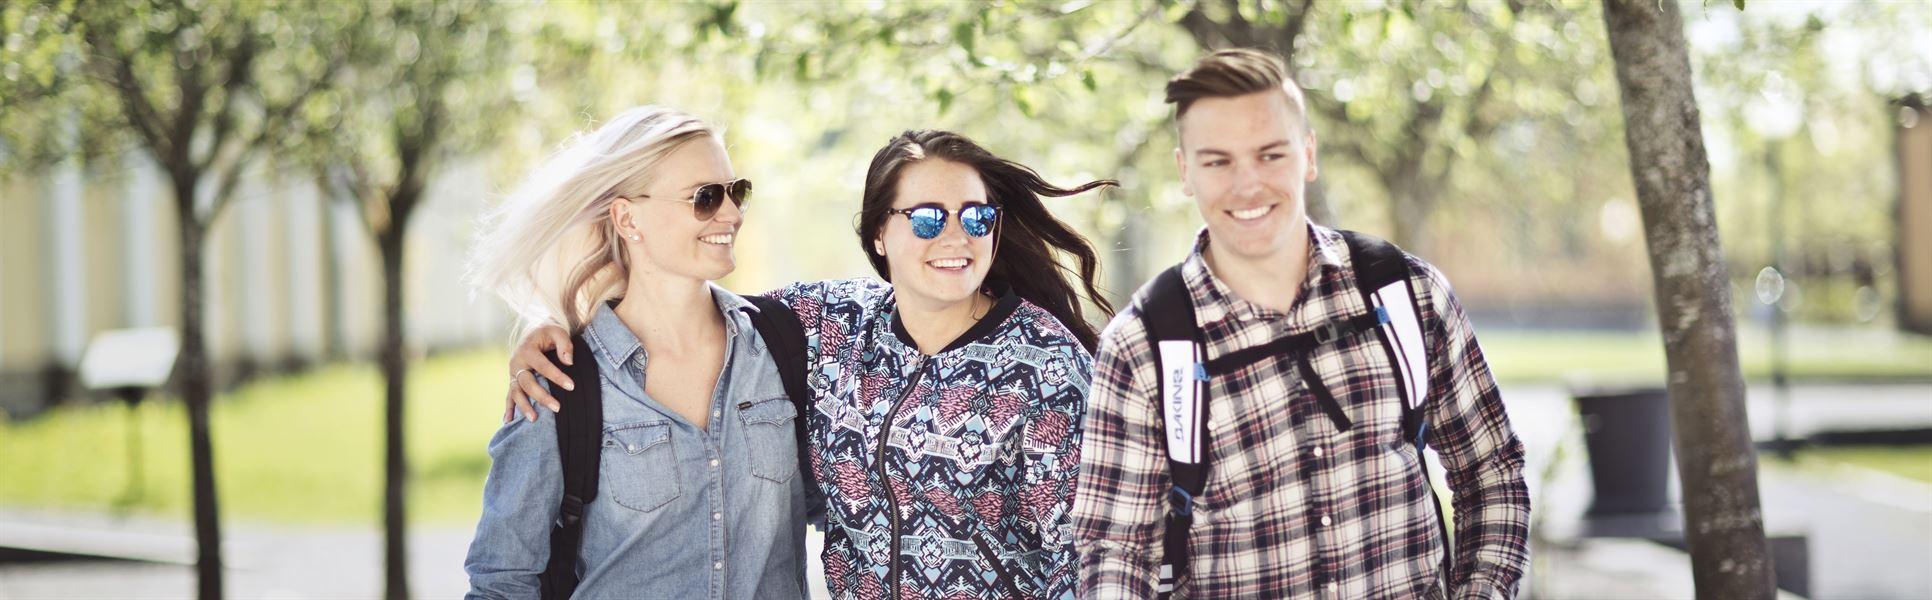 Studenter på Campus Östersund